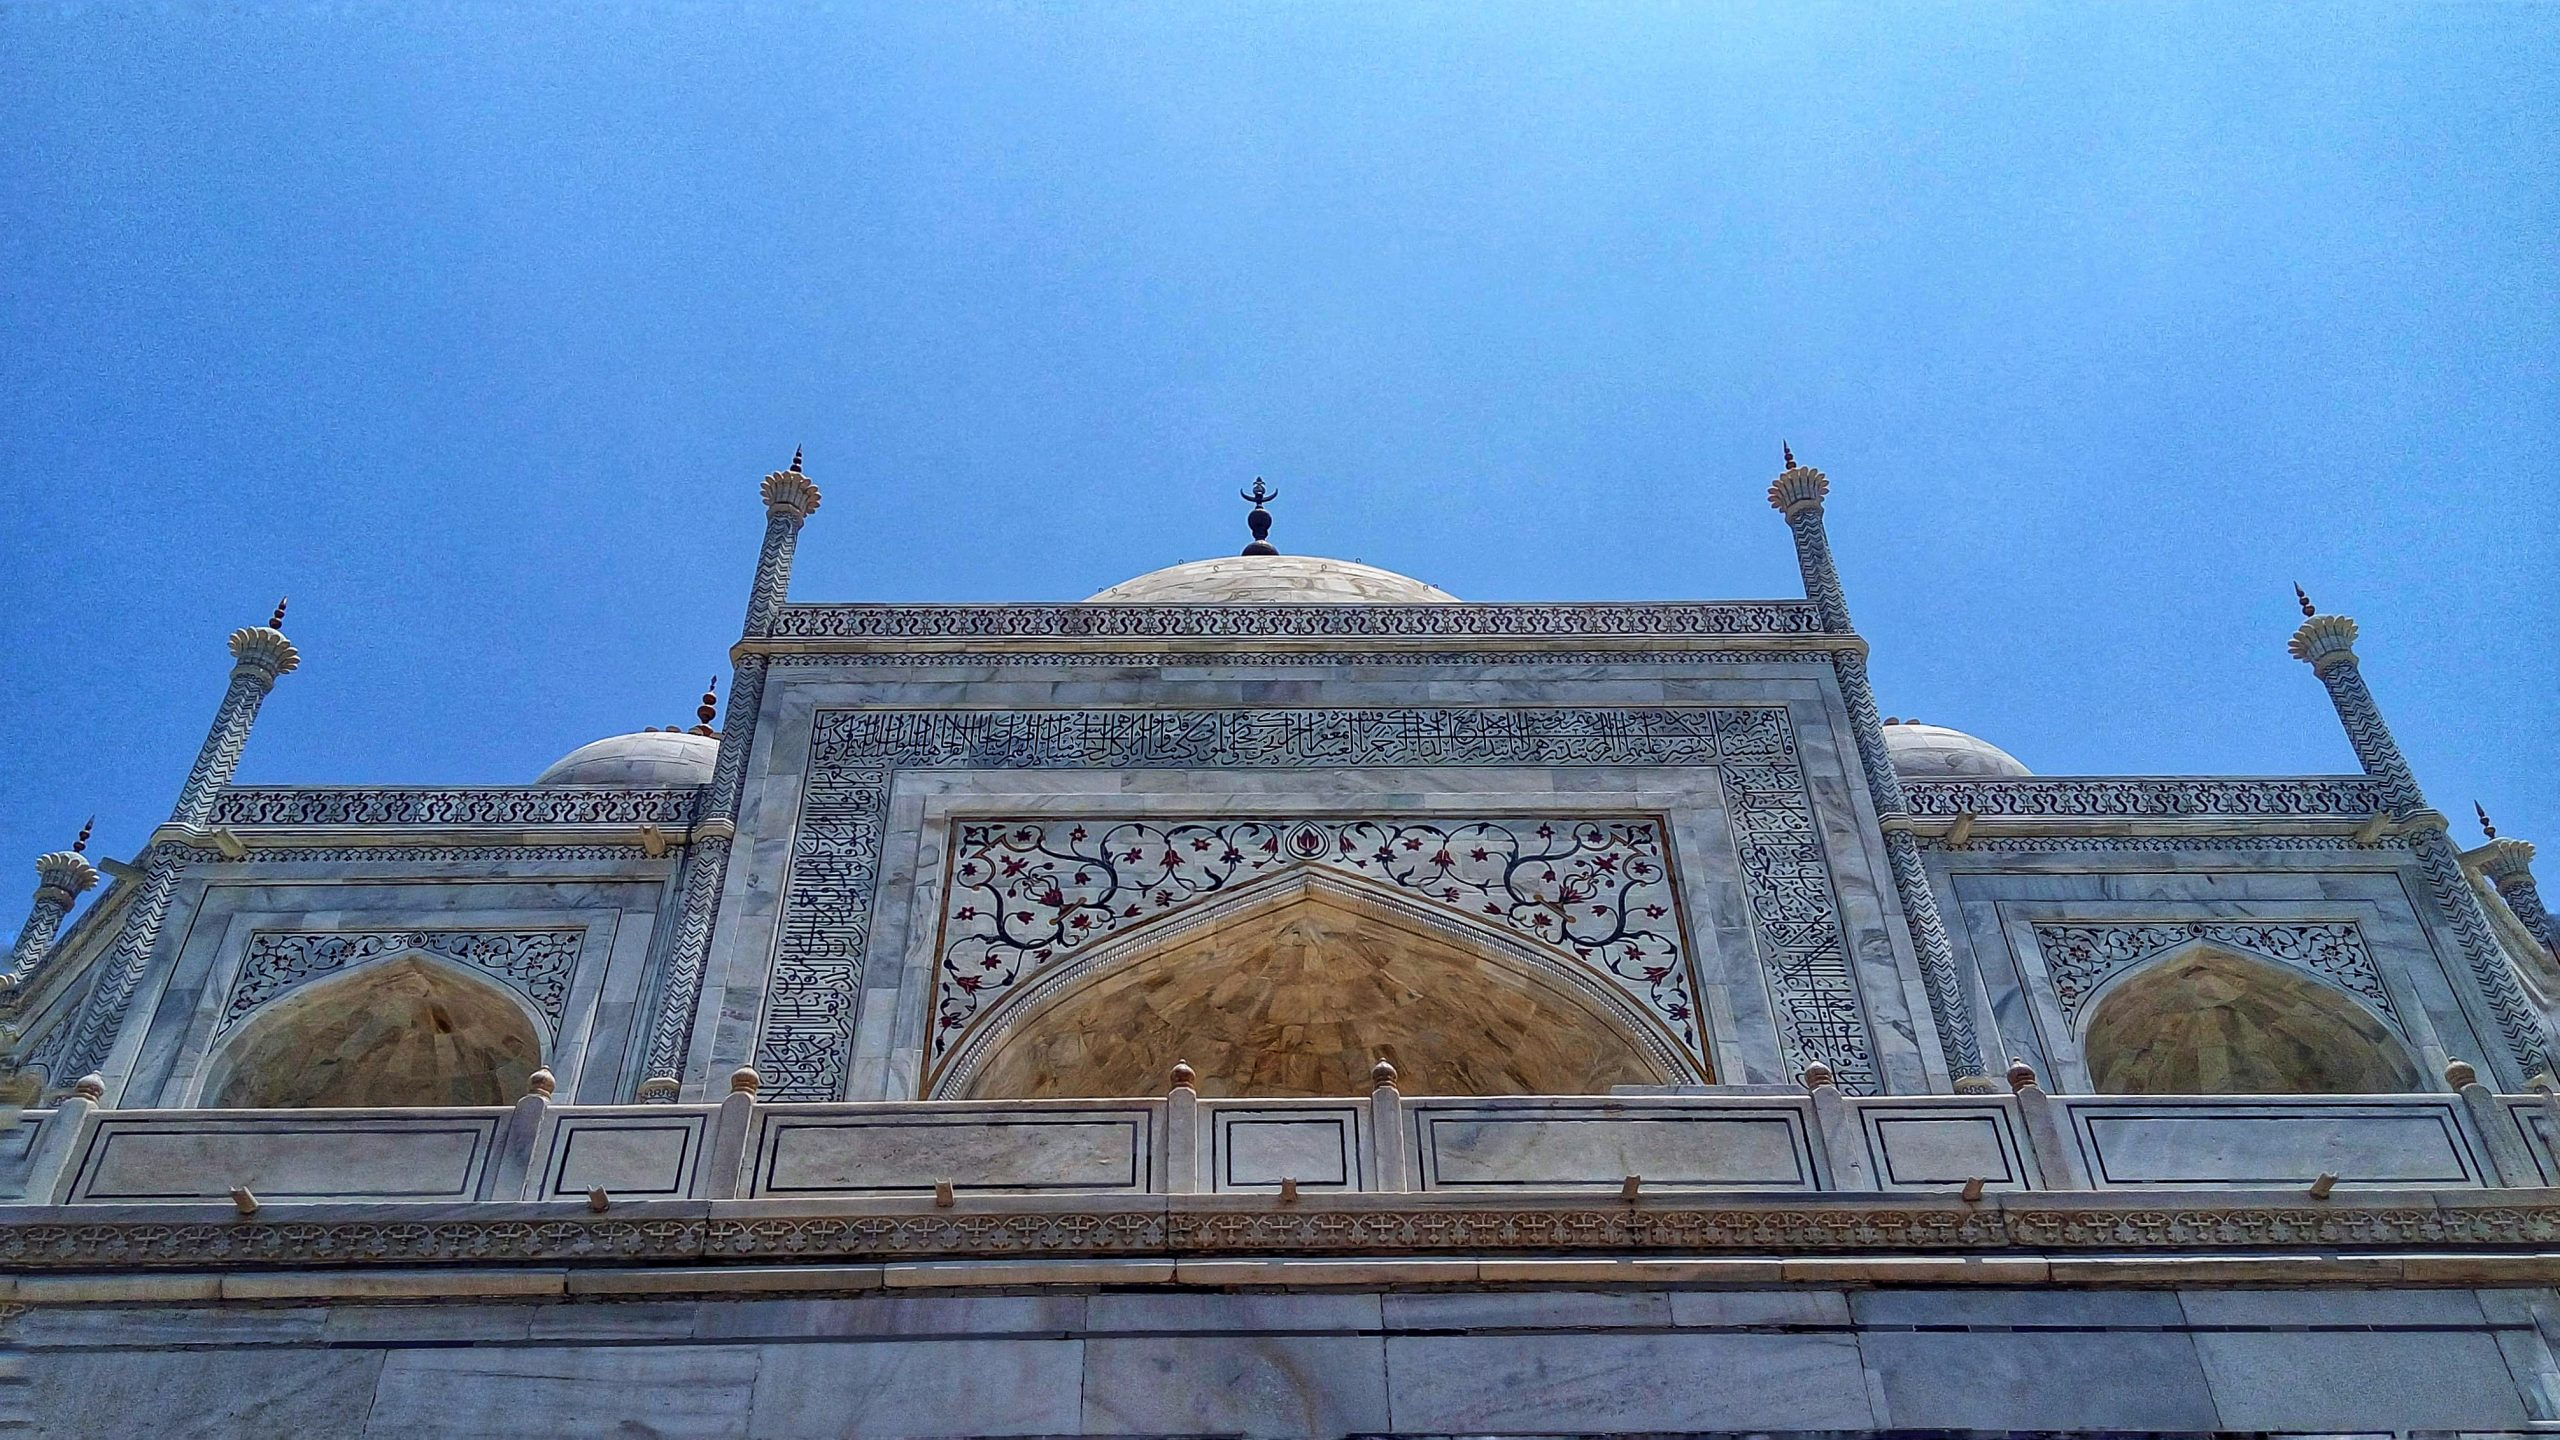 A view of Taj Mahal